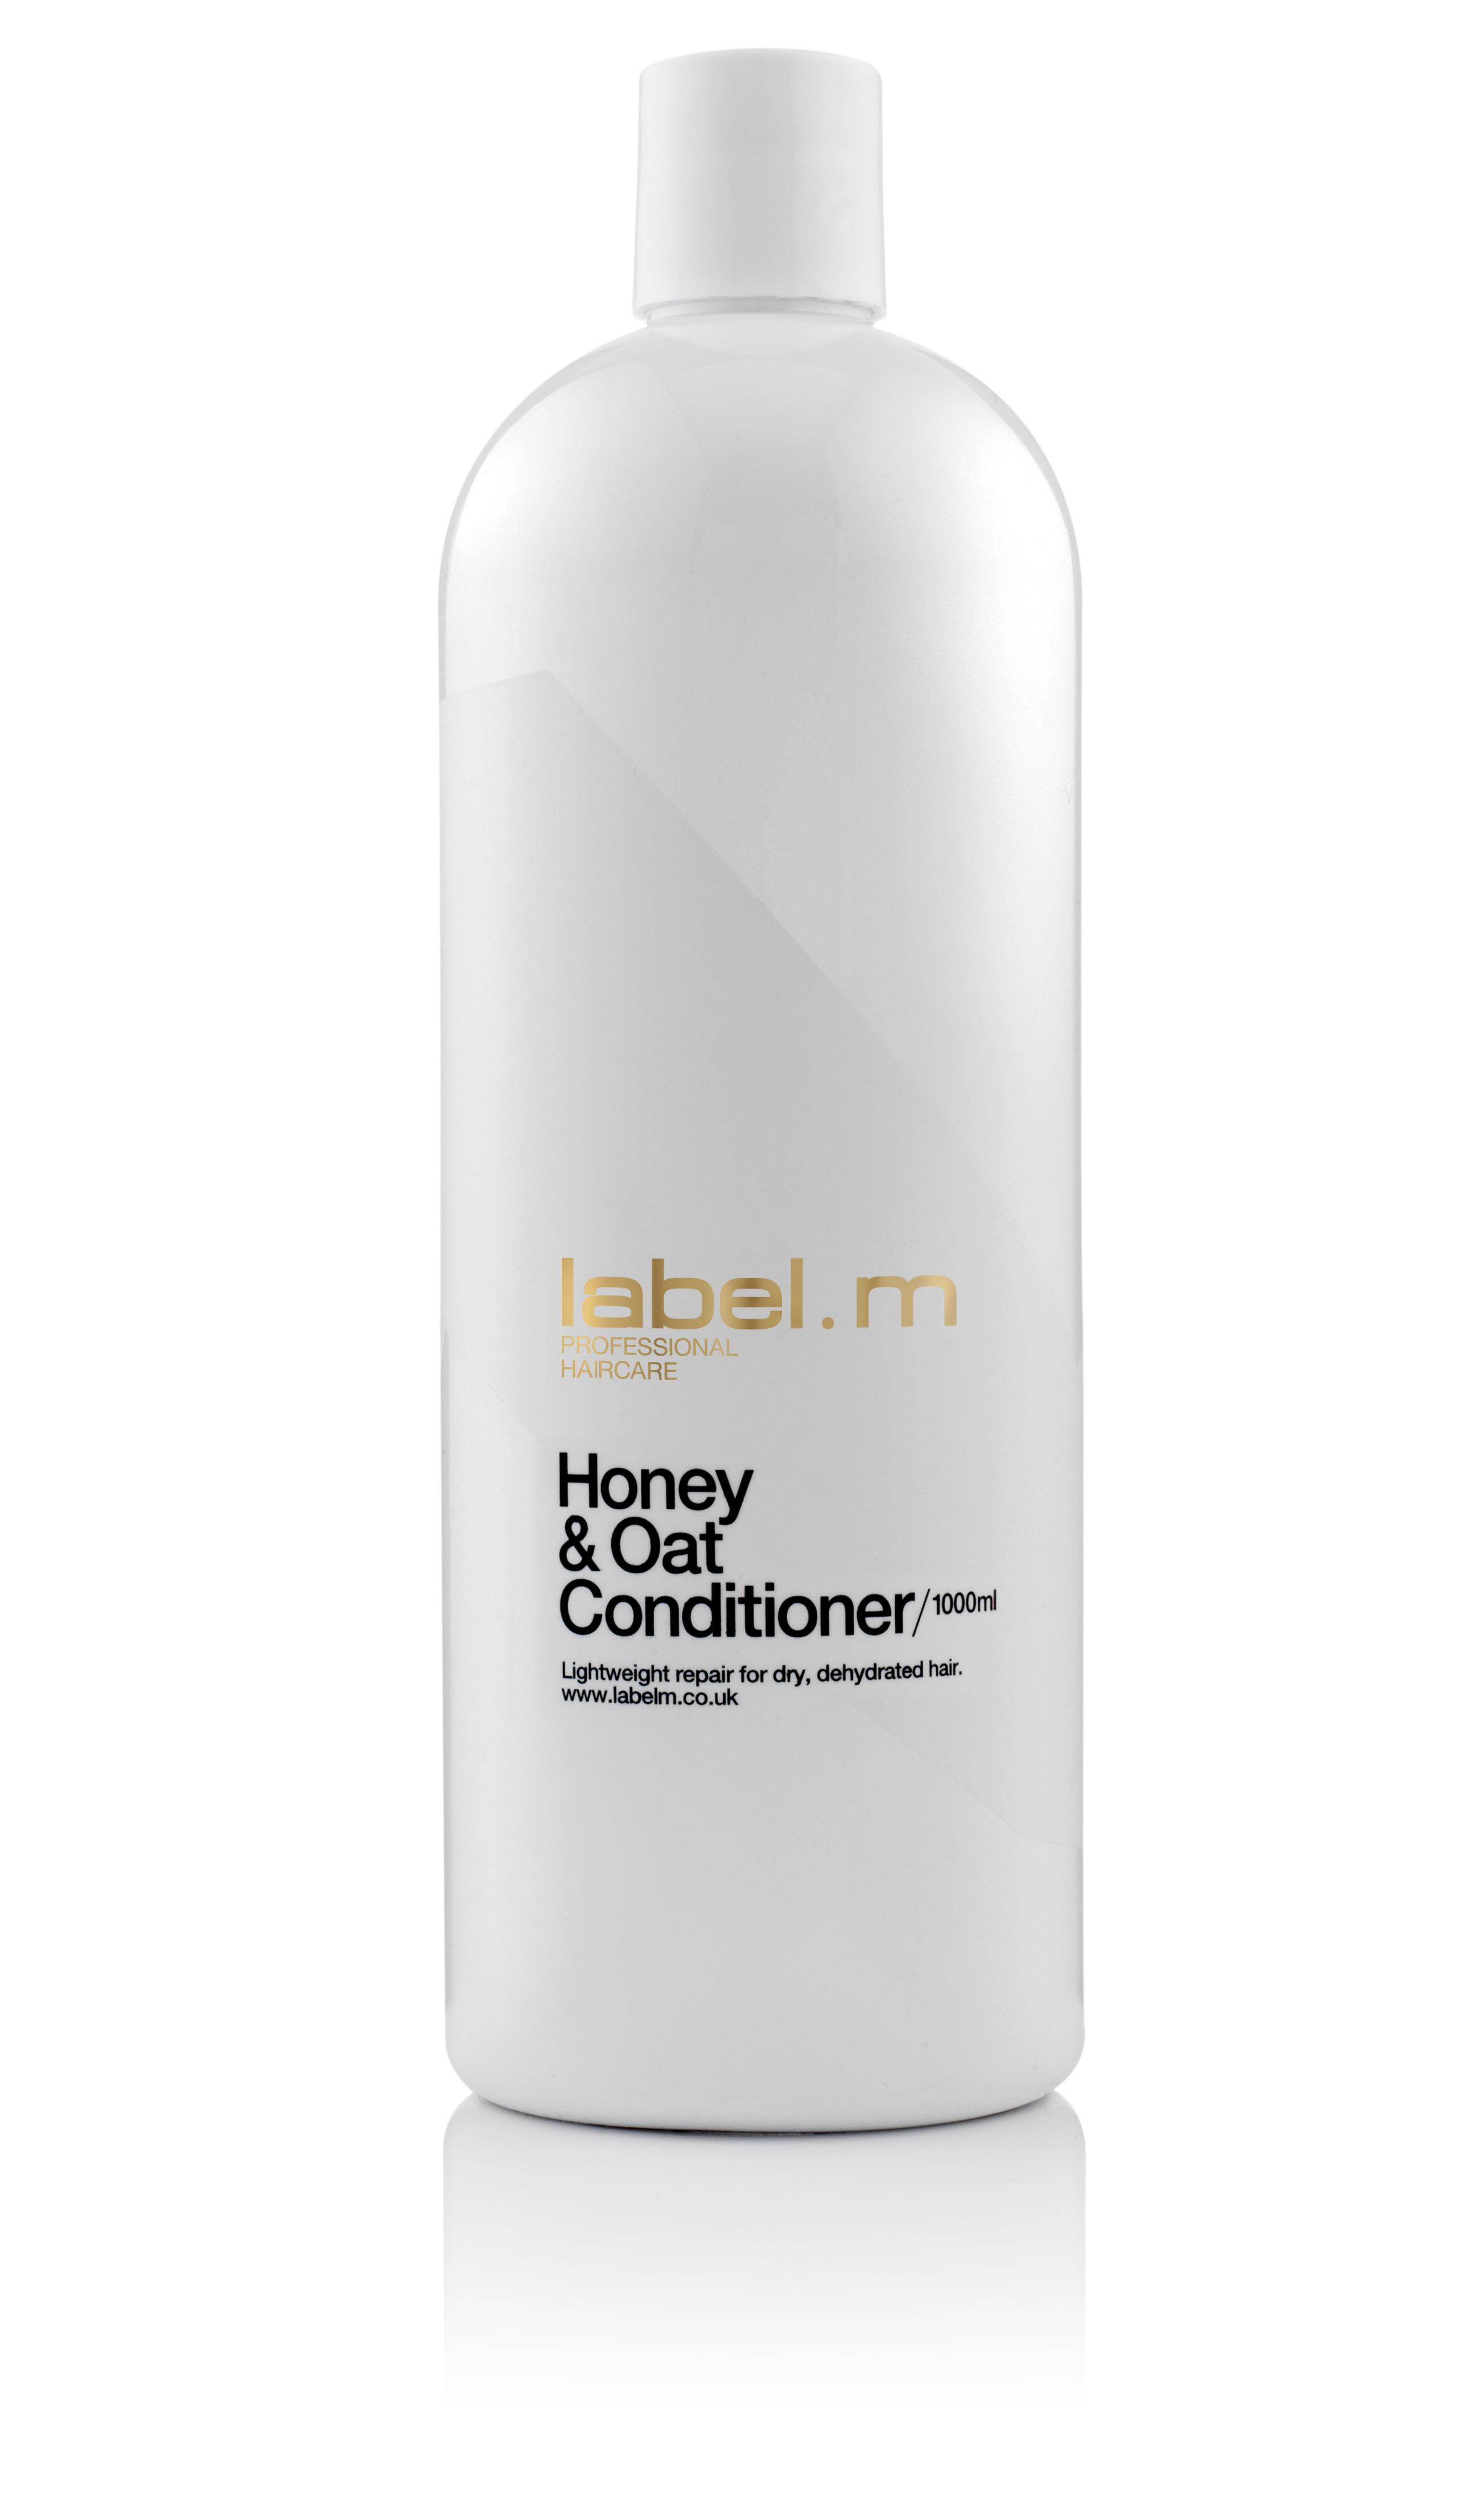 Honey & Oat Conditioner 1000ml